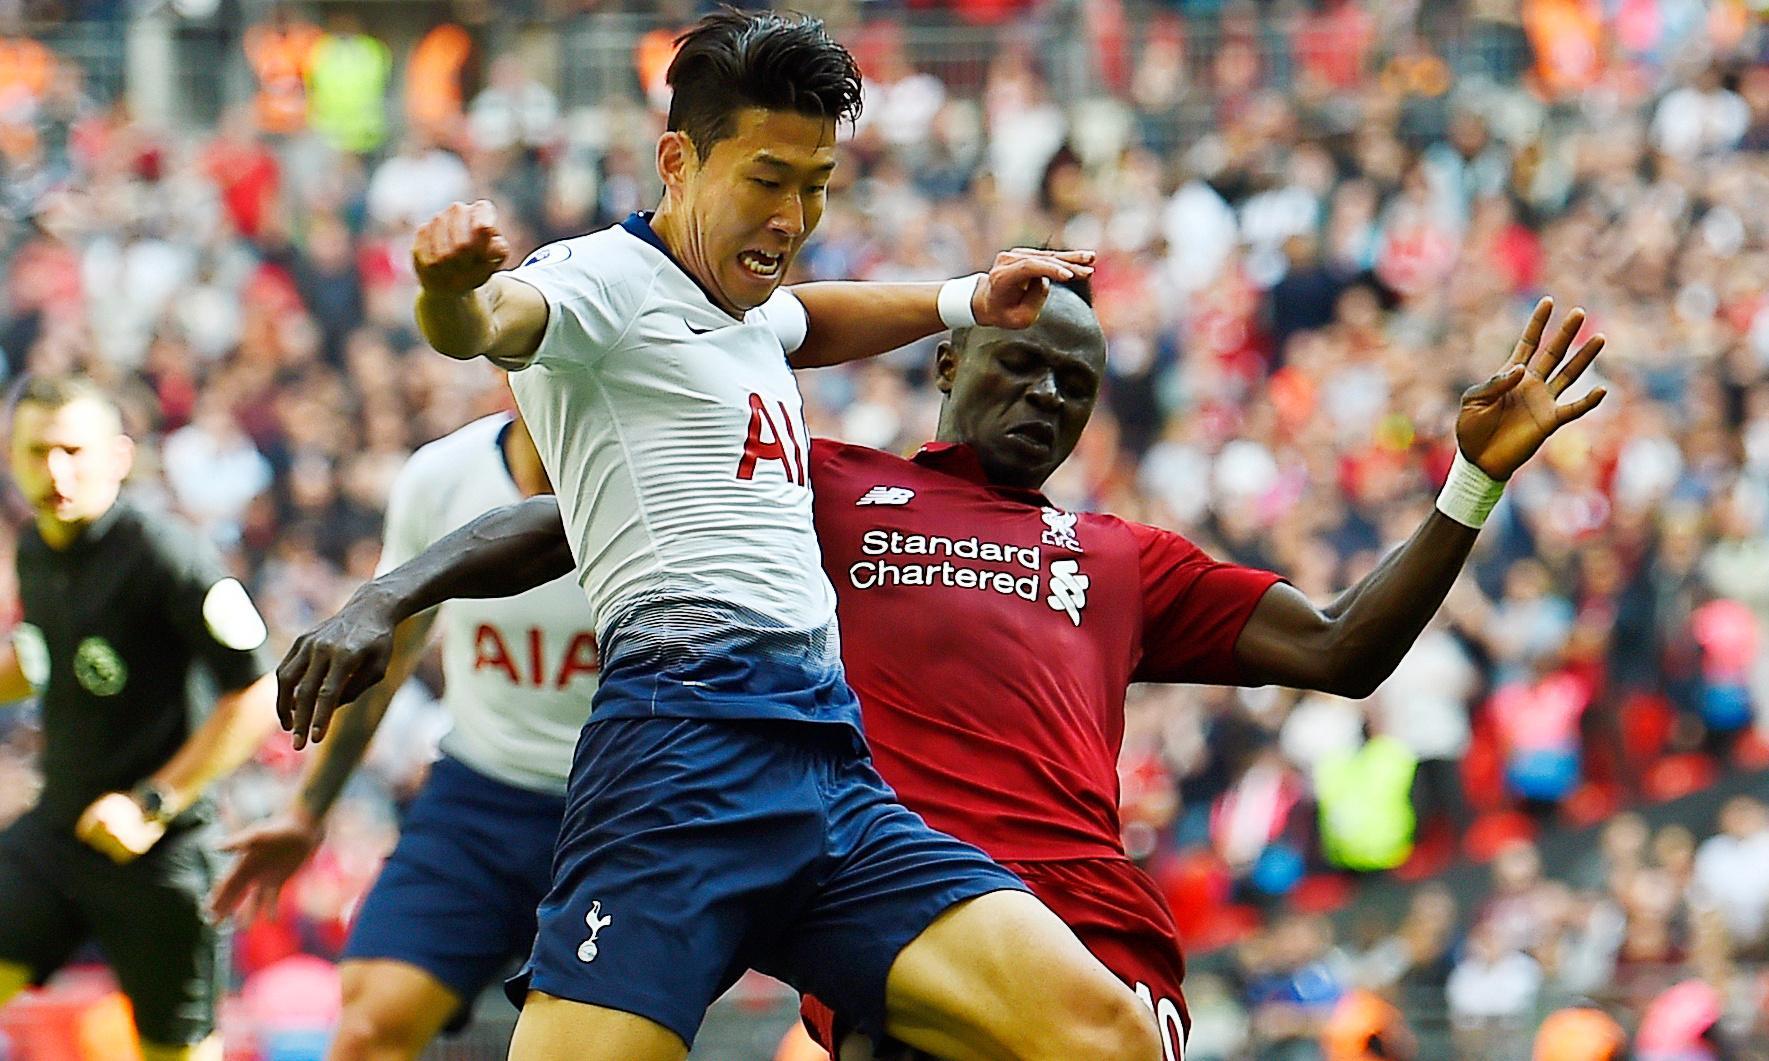 Champions League no longer contest of champions but battle between leagues